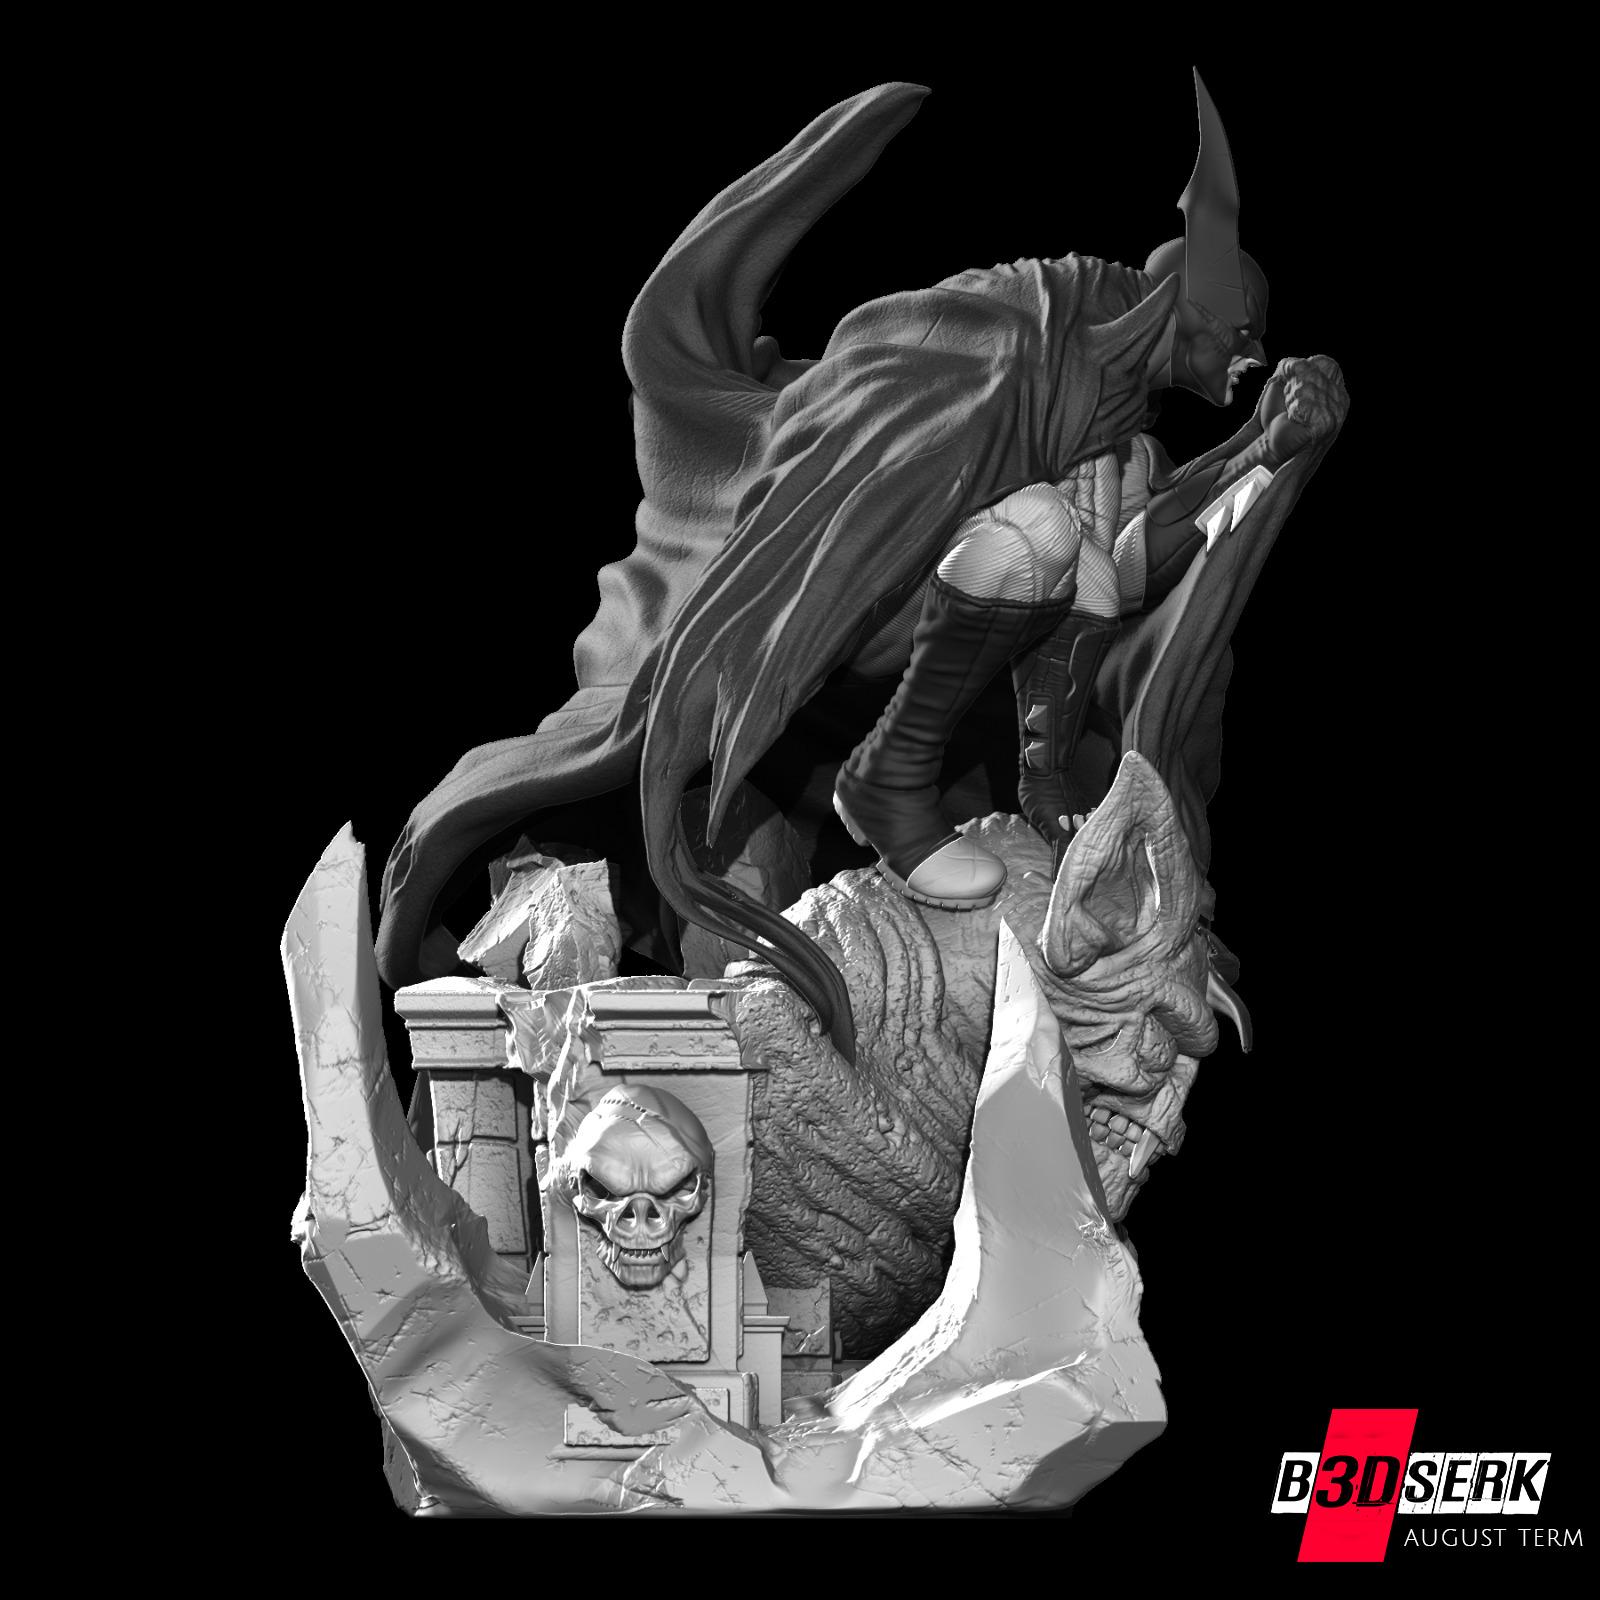 200820 B3DSERK - Batman promo 09.jpg Download free STL file Batman 3d sculpture tested and ready for printing by B3DSERK Studios • 3D printer object, b3dserk